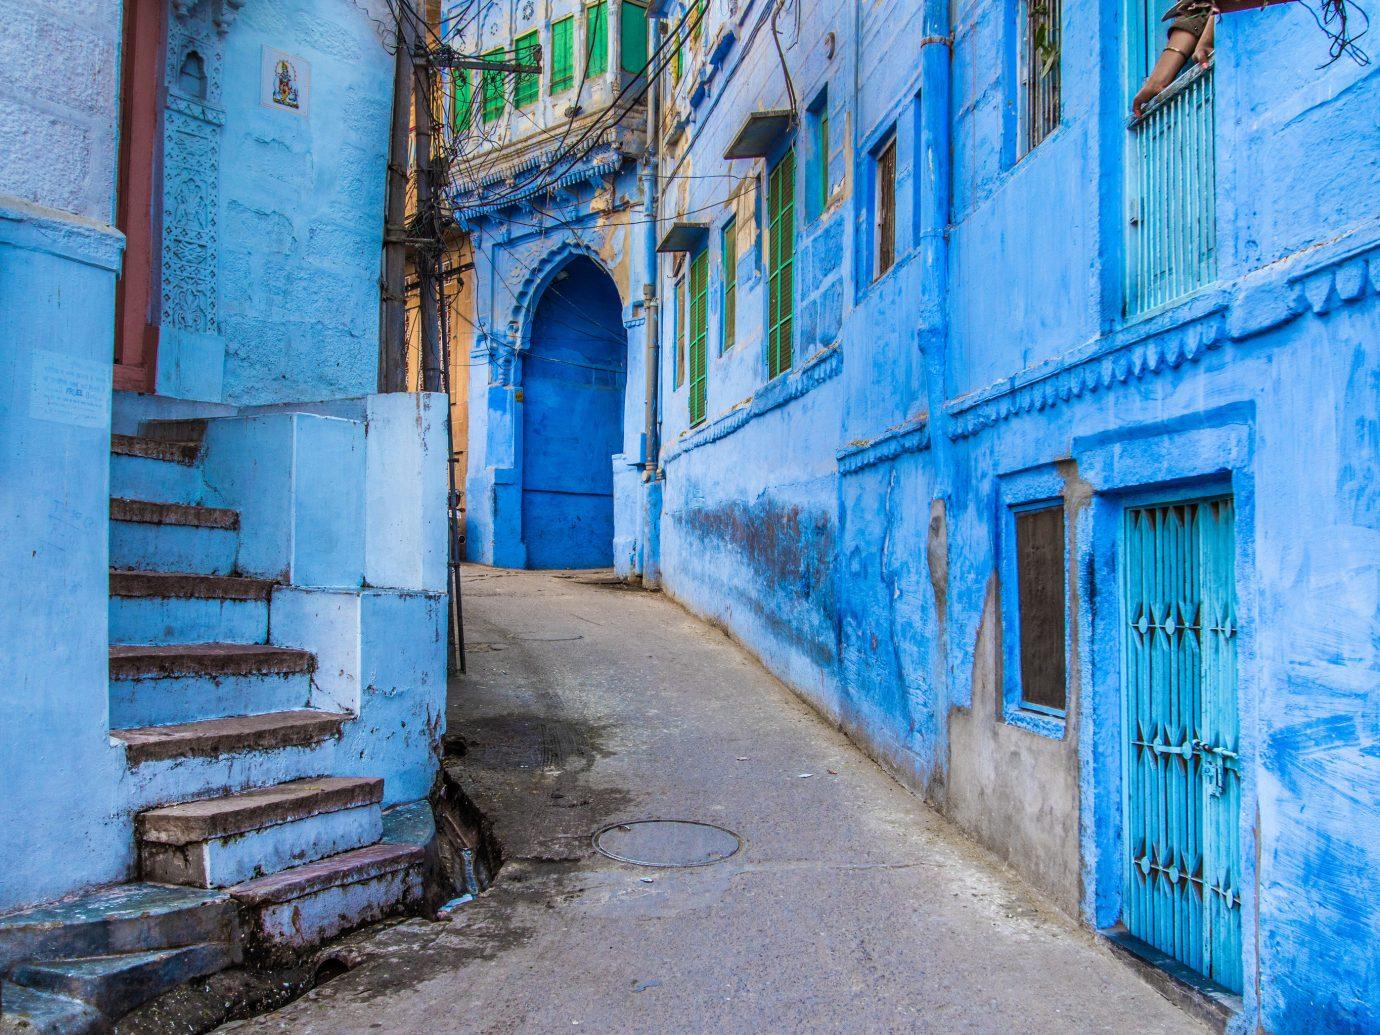 India Jaipur Jodhpur Trip Ideas building blue outdoor alley Town wall neighbourhood street way old facade window sky house road sidewalk dirty